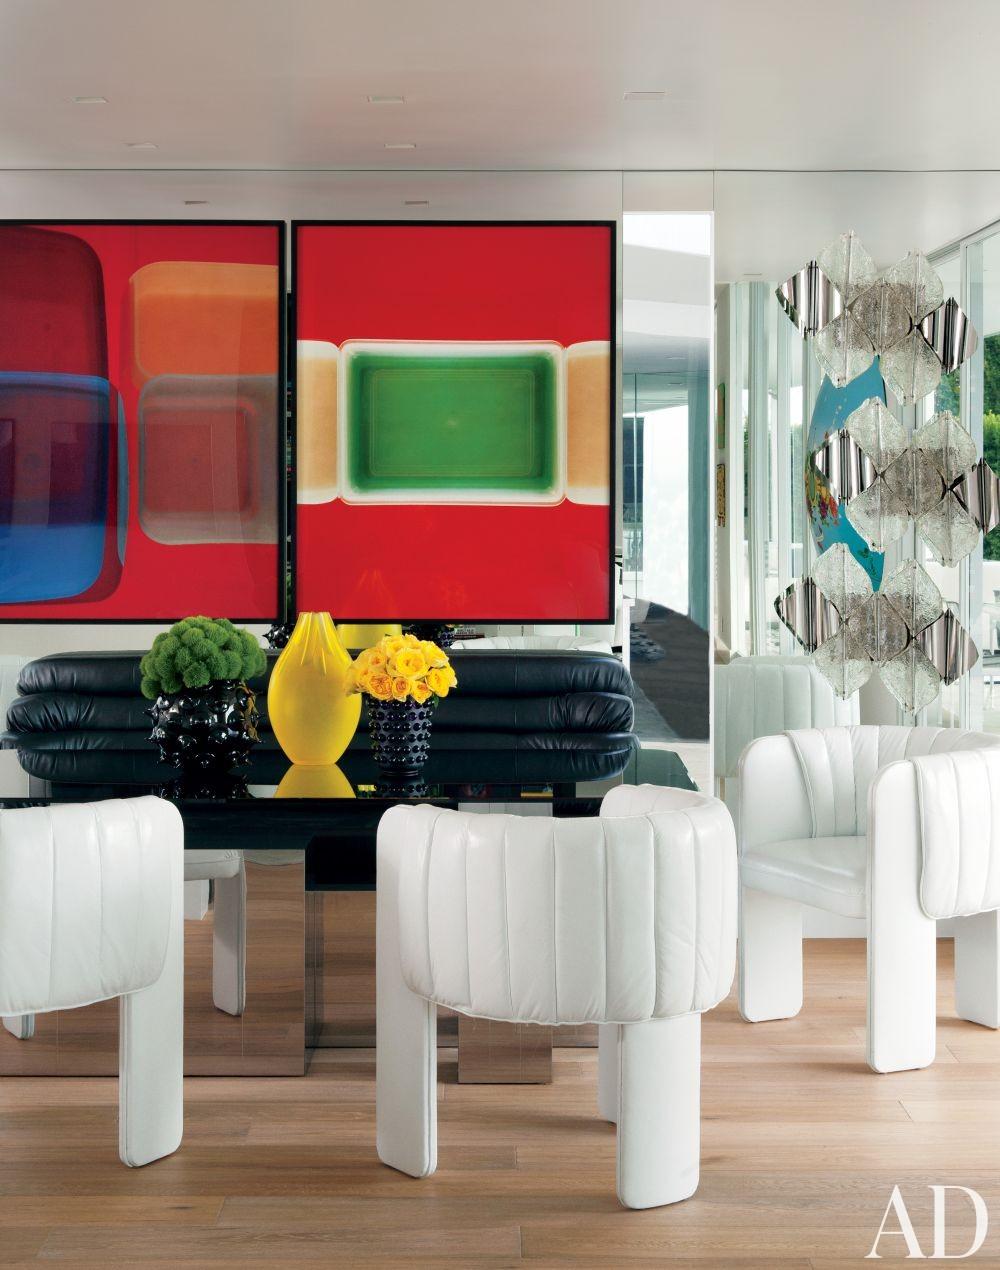 Contemporary Dining Room by Martyn Lawrence Bullard Design in Los Angeles, California